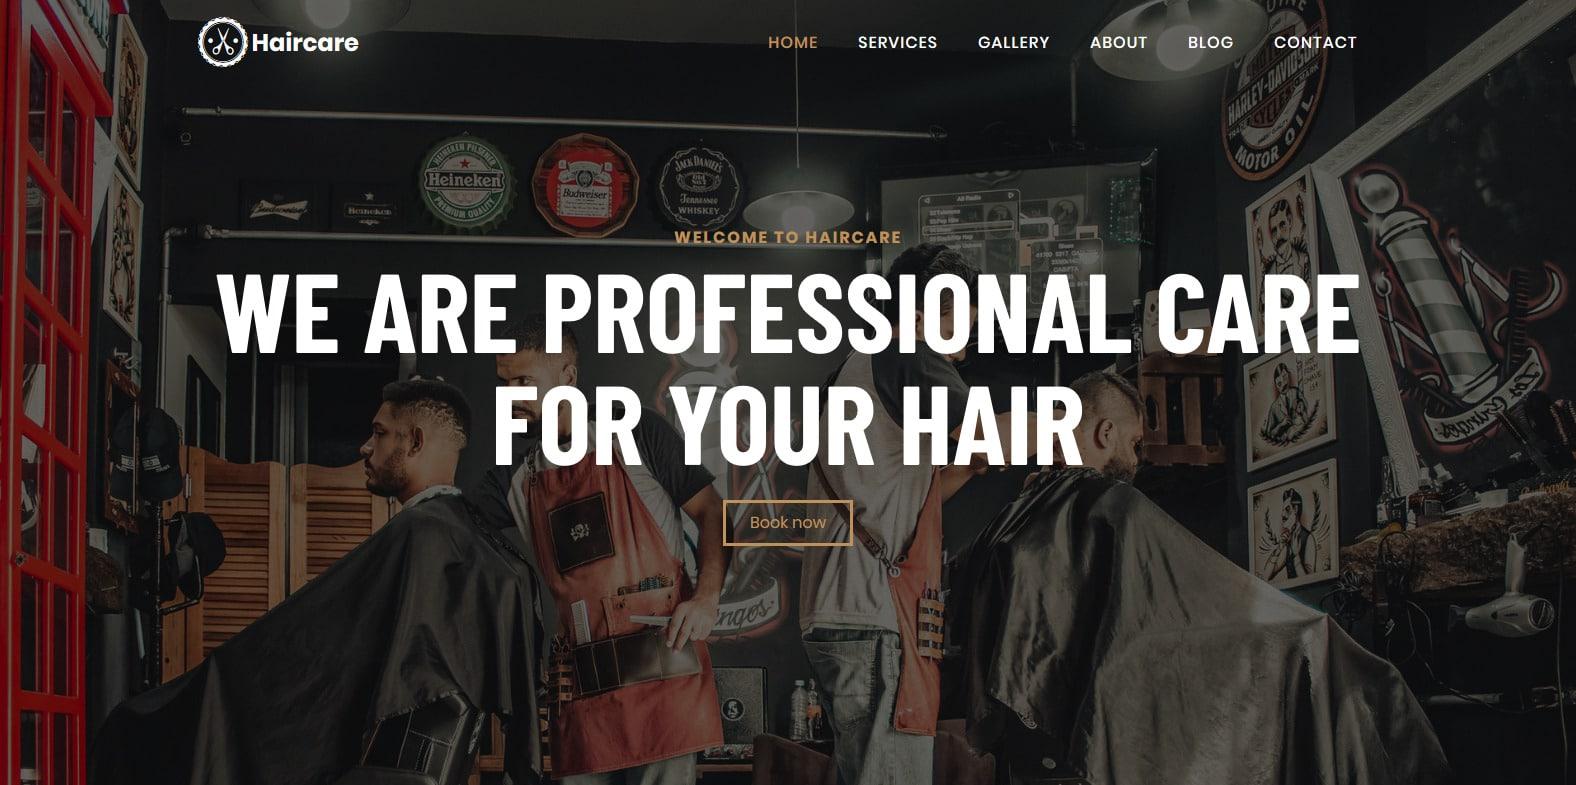 haircare-spa-salon-website-template